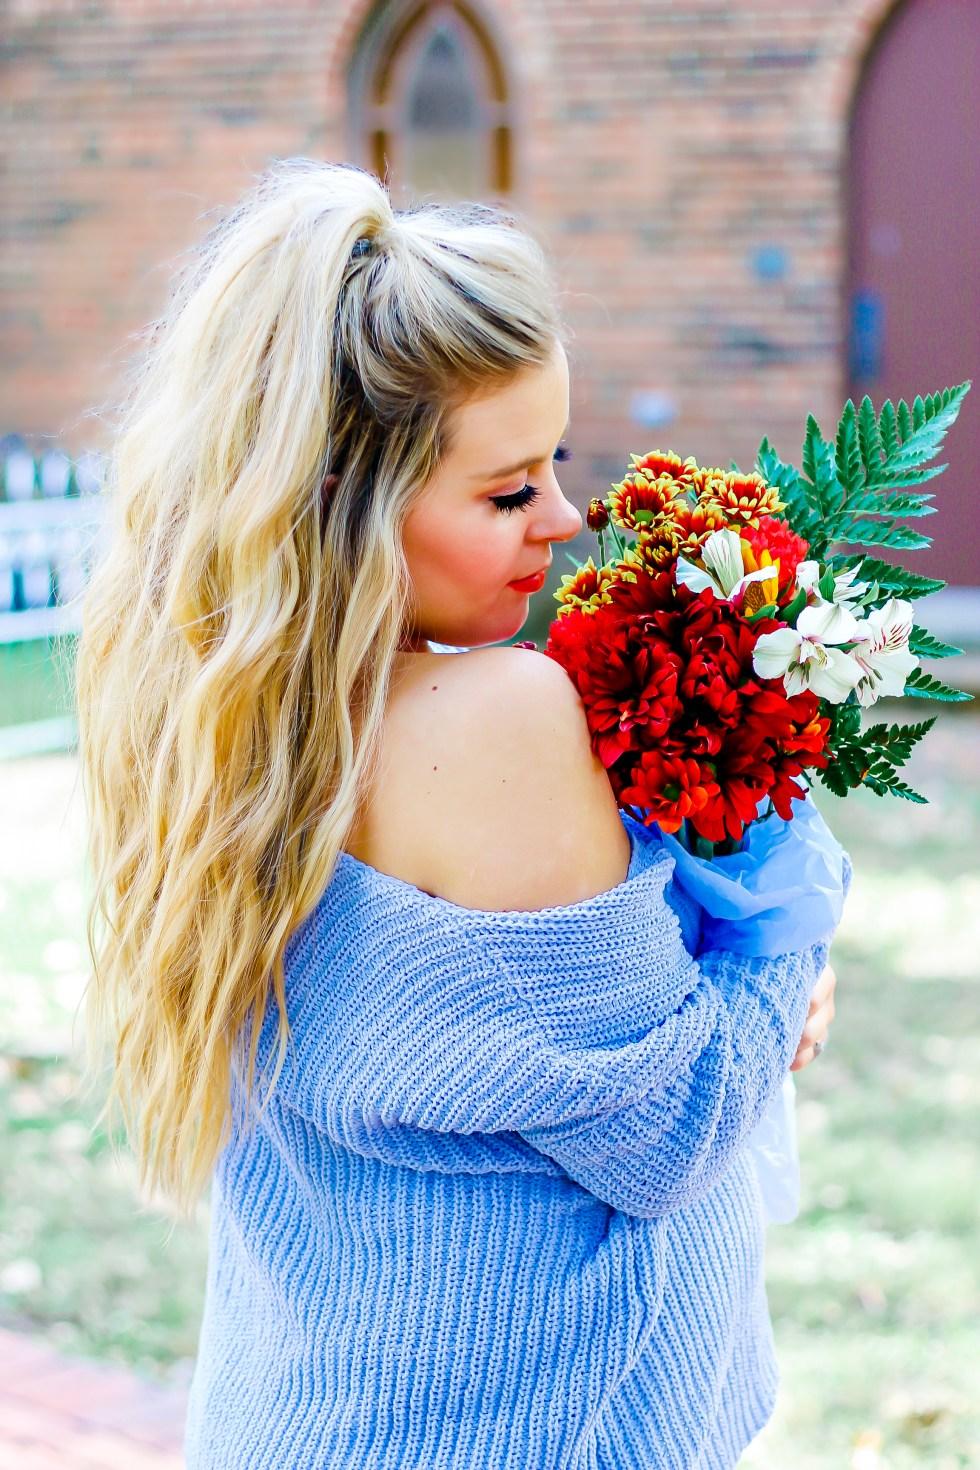 bluevnecksweater